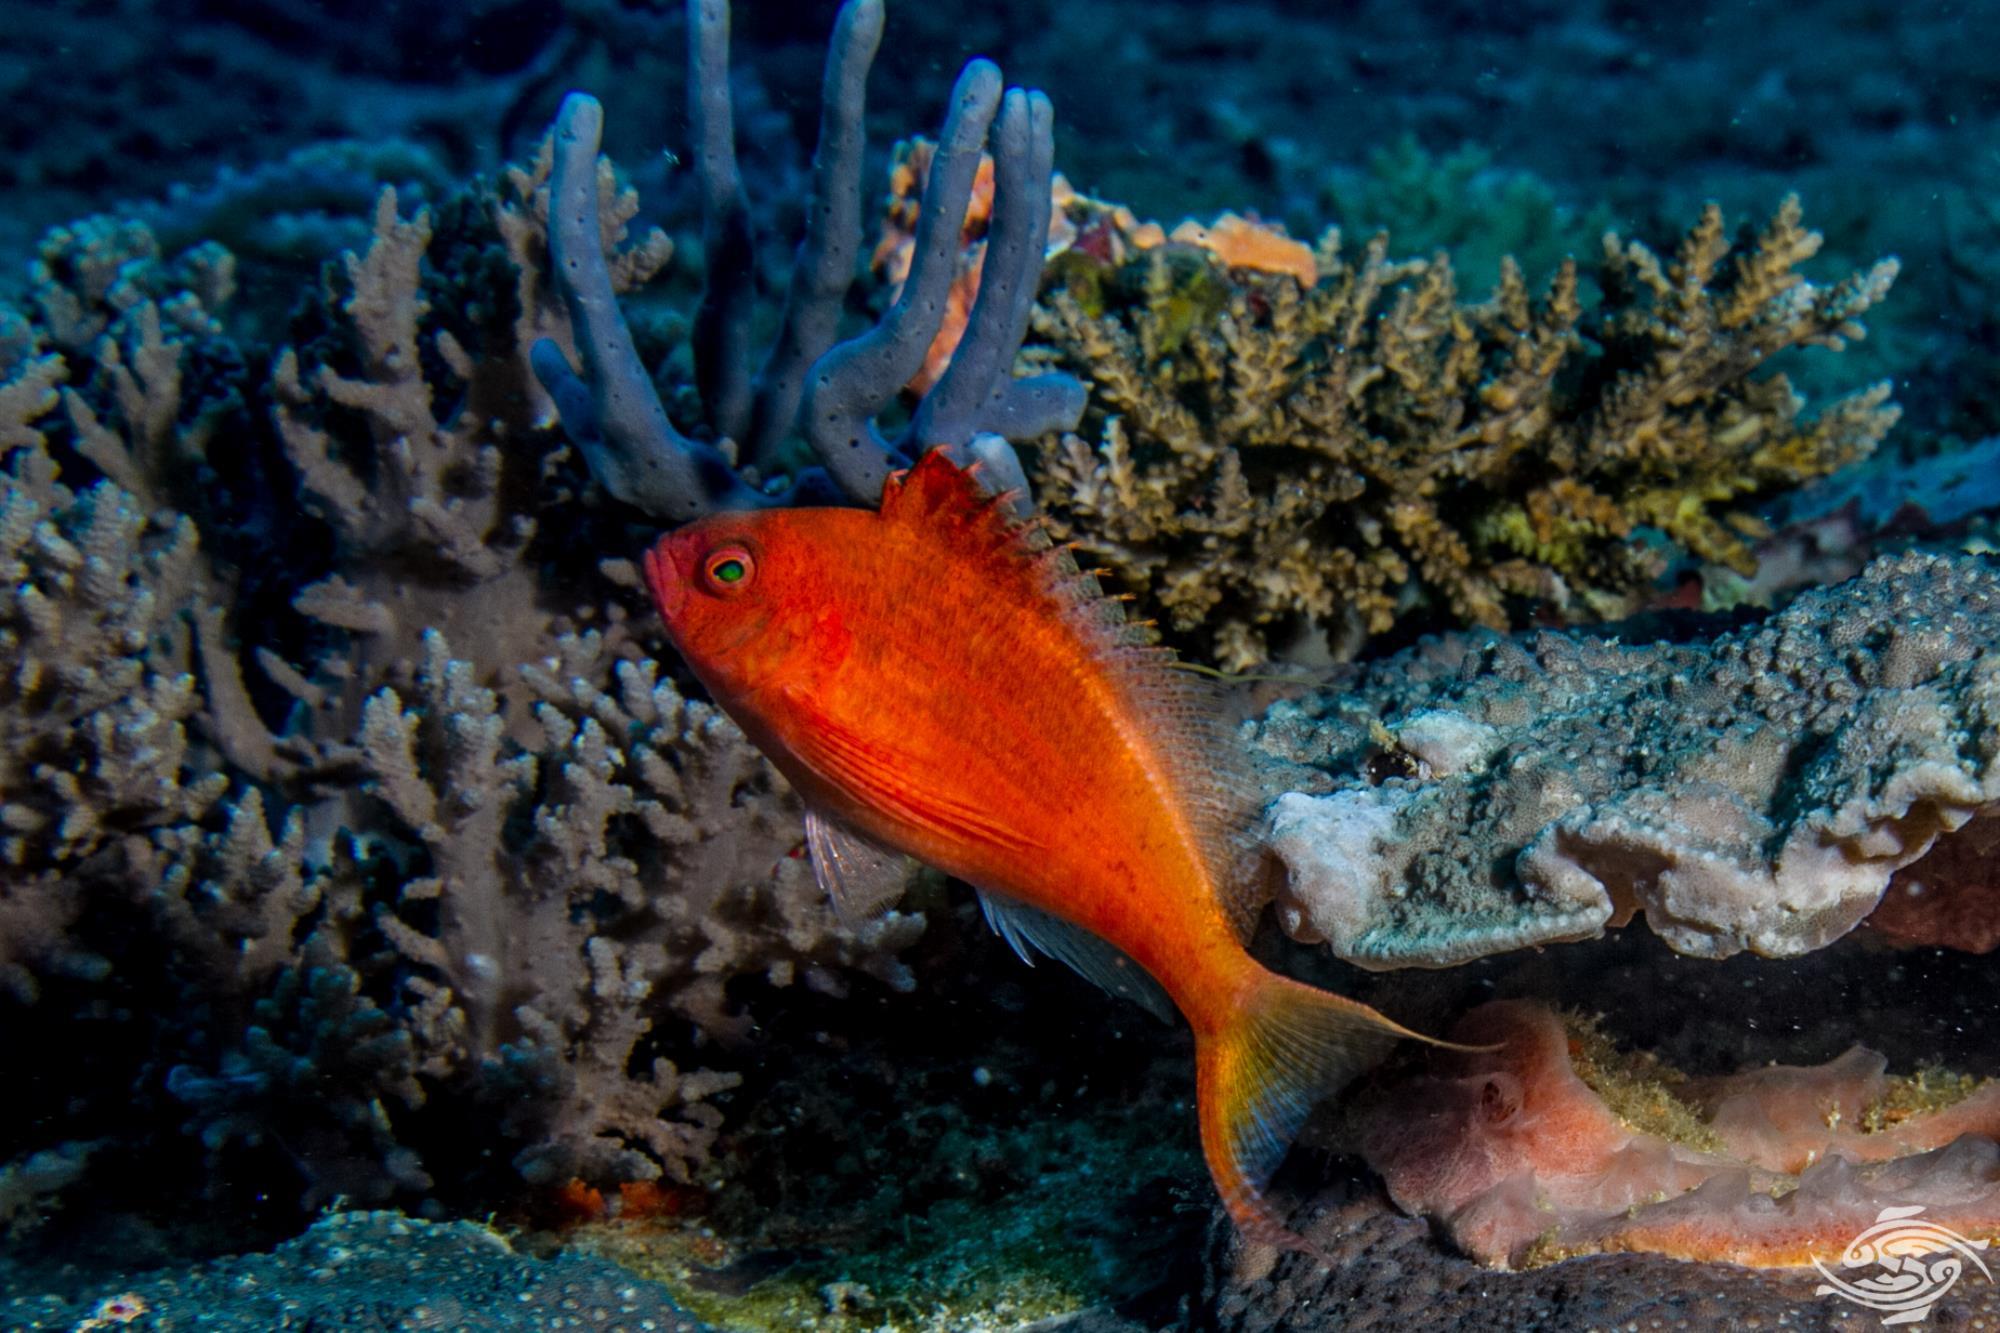 swallowtail hawkfish, Cyprinocirrhites polyactis